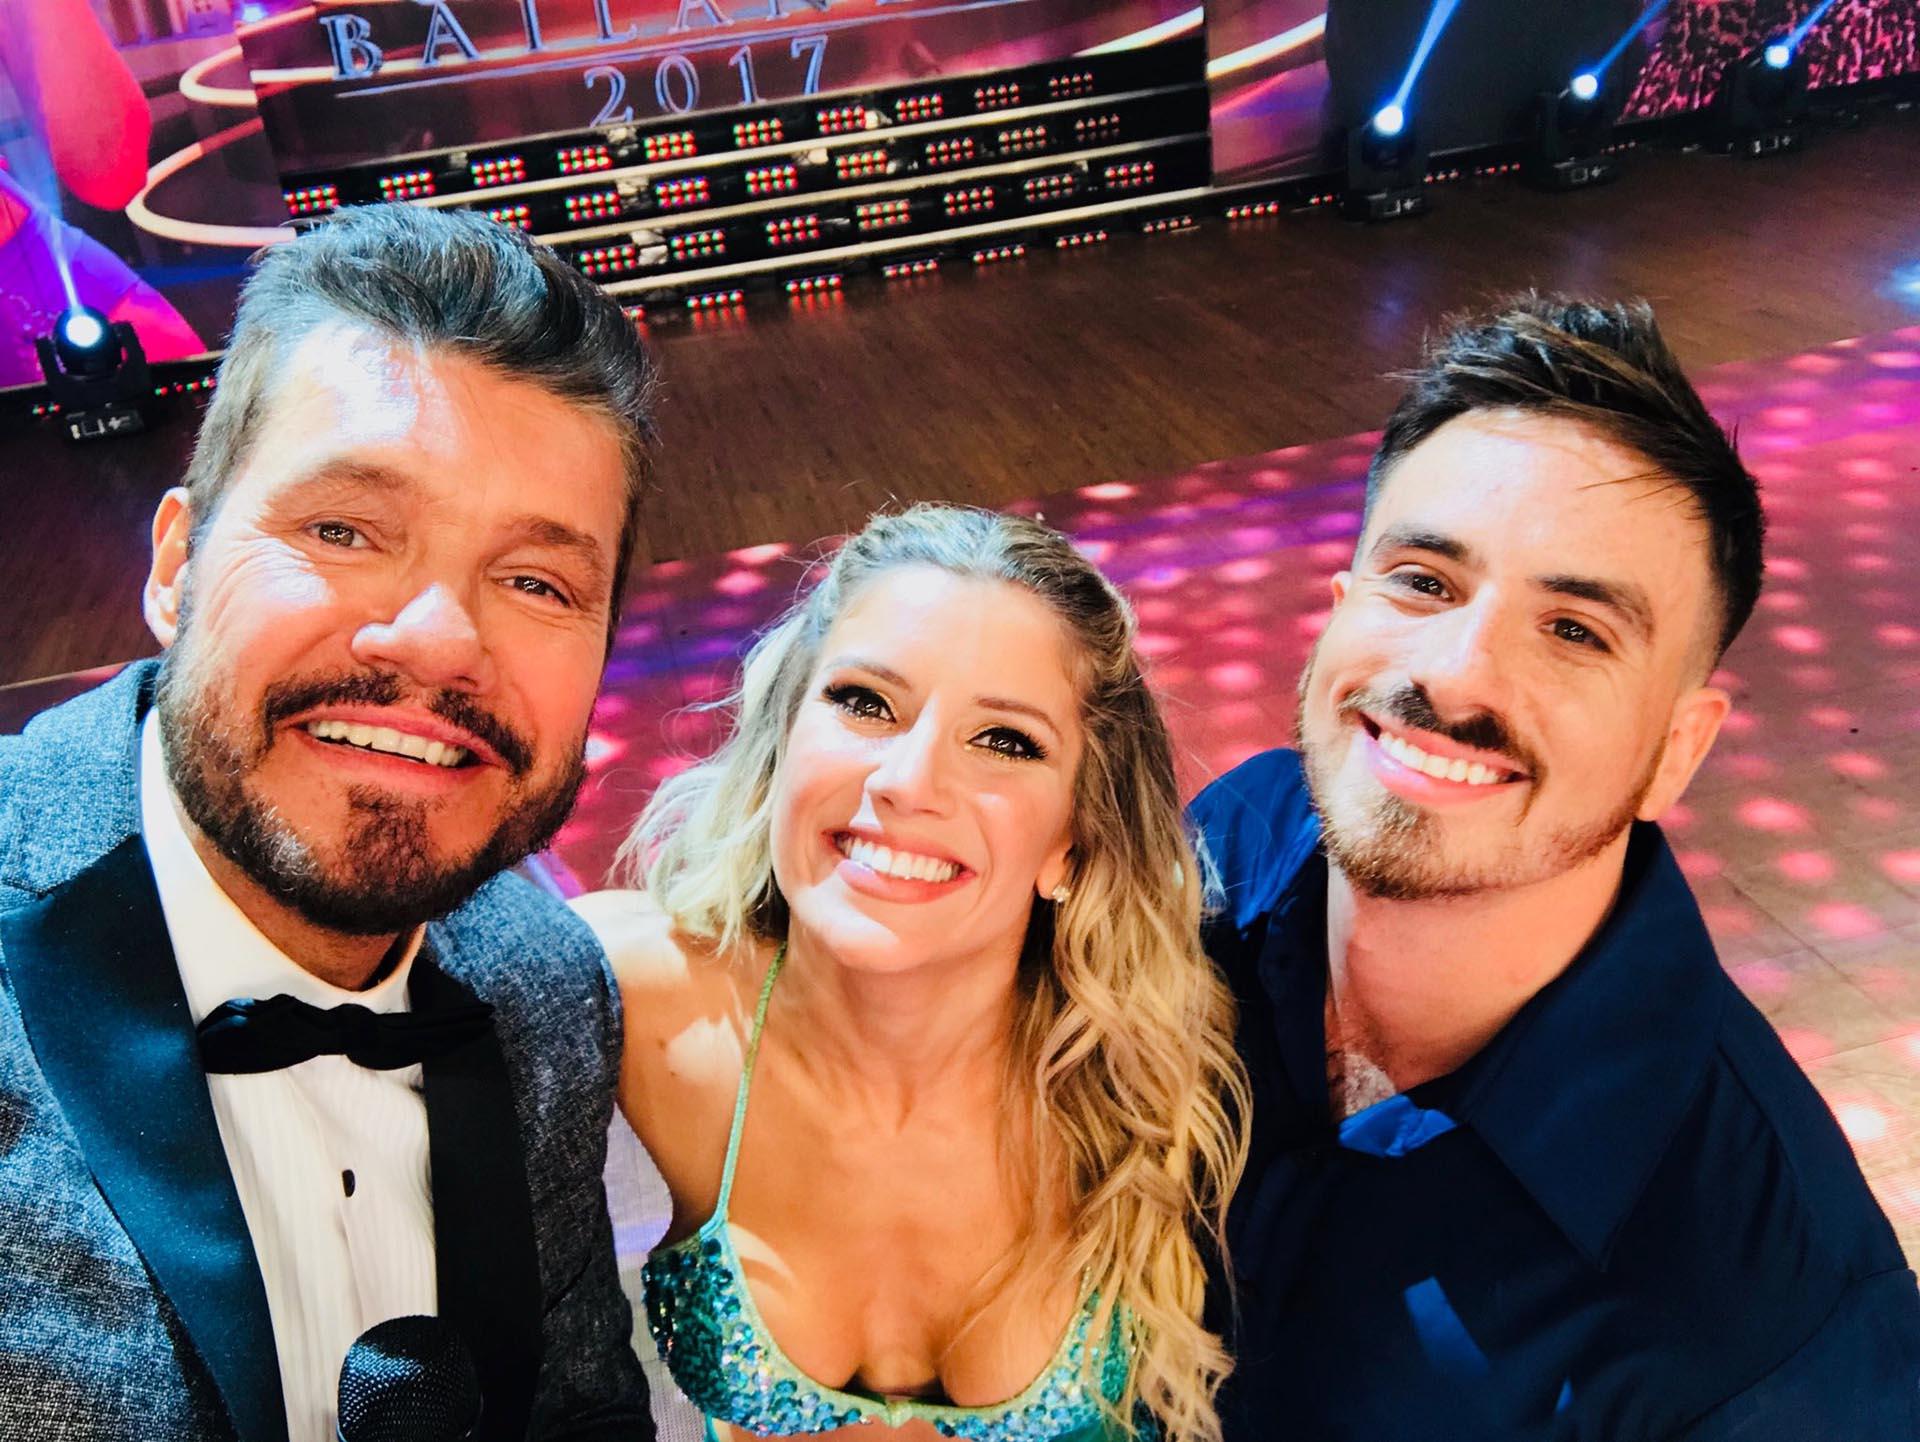 Selfie de Tinelli con Fede Bal y Laurita Fernández